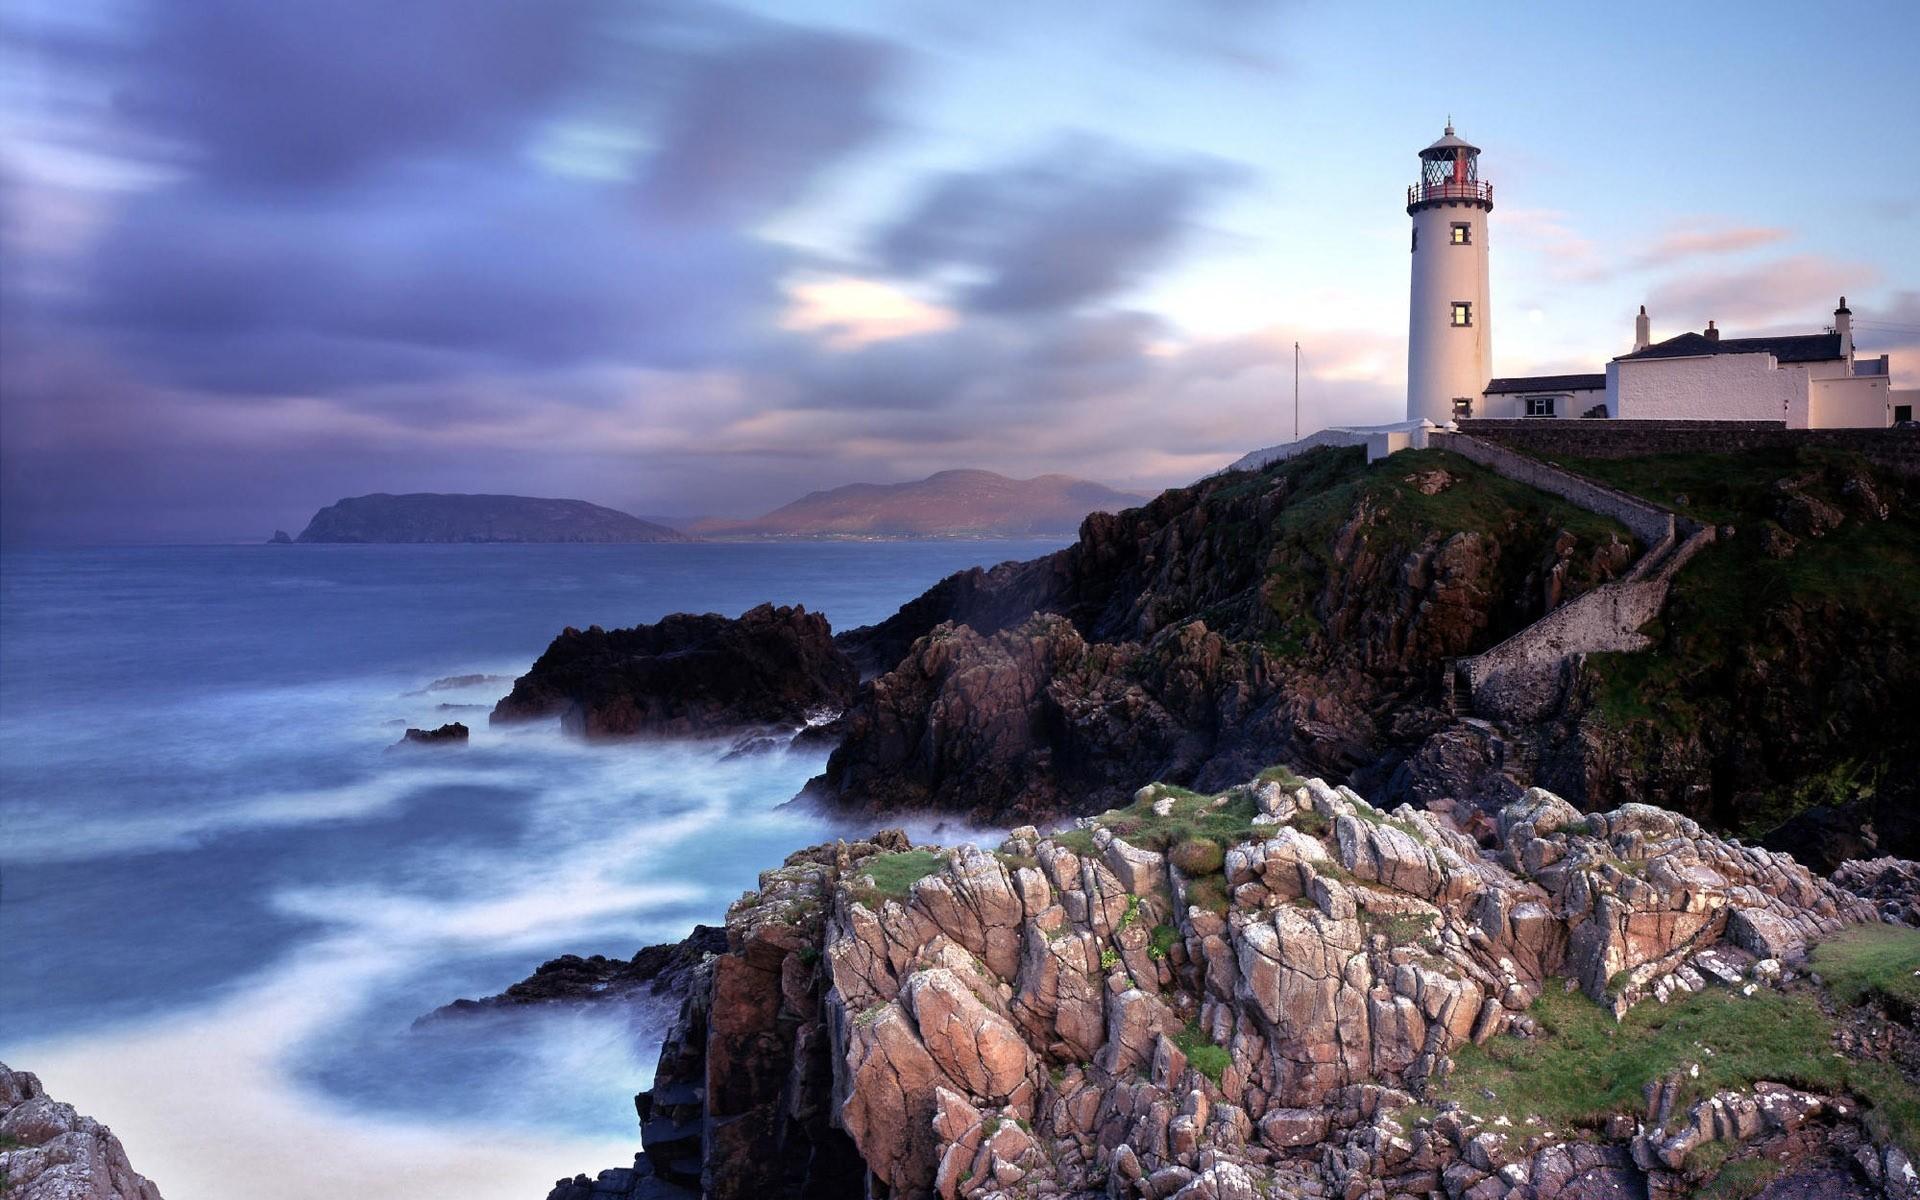 природа маяк море скалы бесплатно